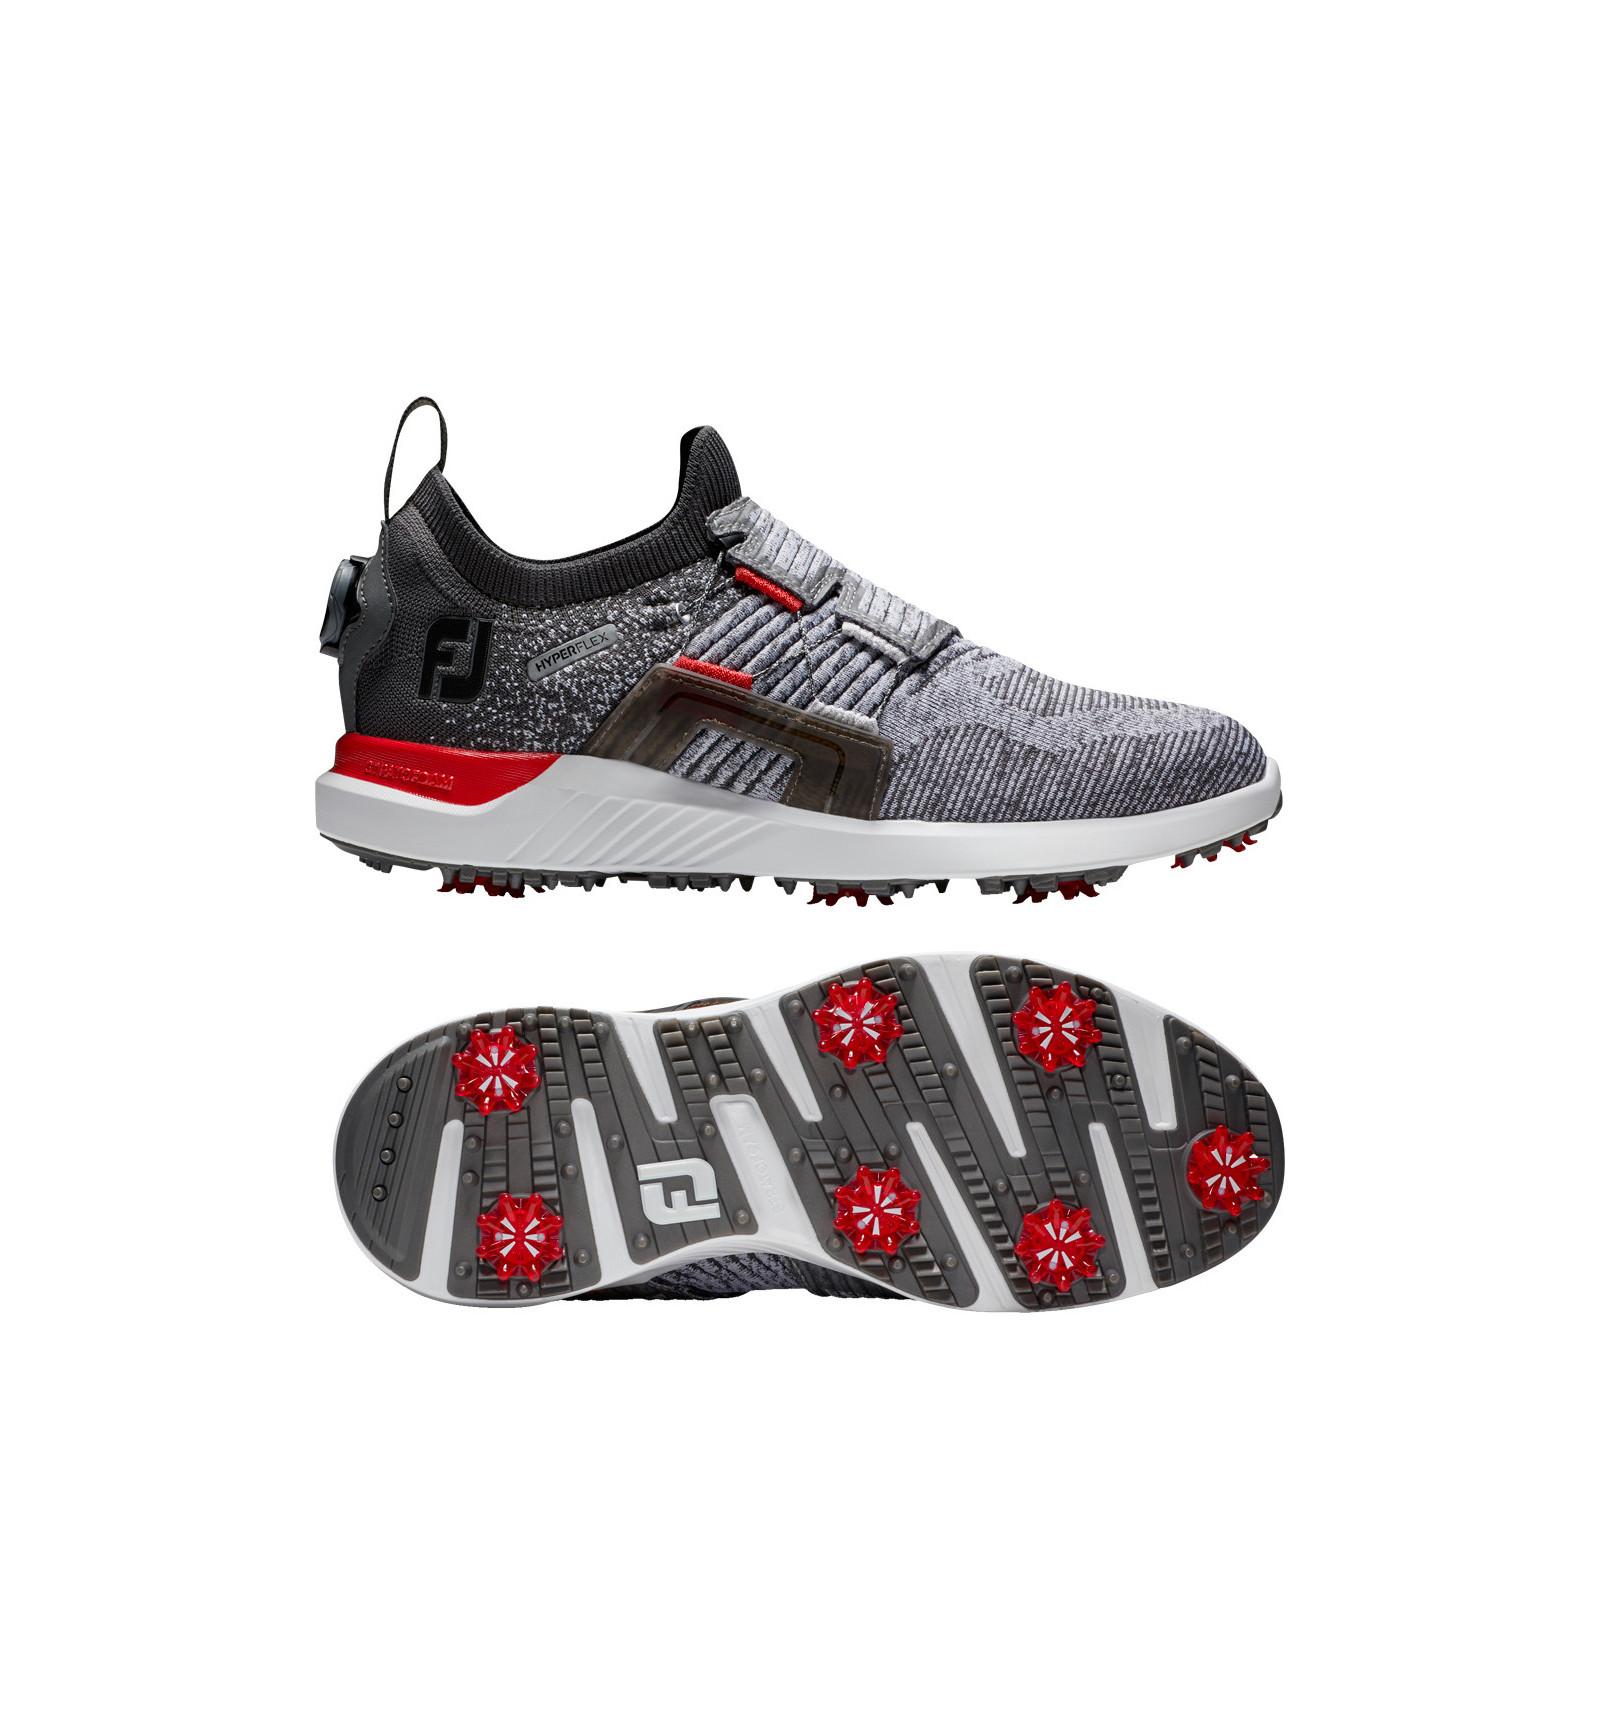 Chaussures de golf FootJoy Hyperflex BOA Grey Black Red - La Route ...